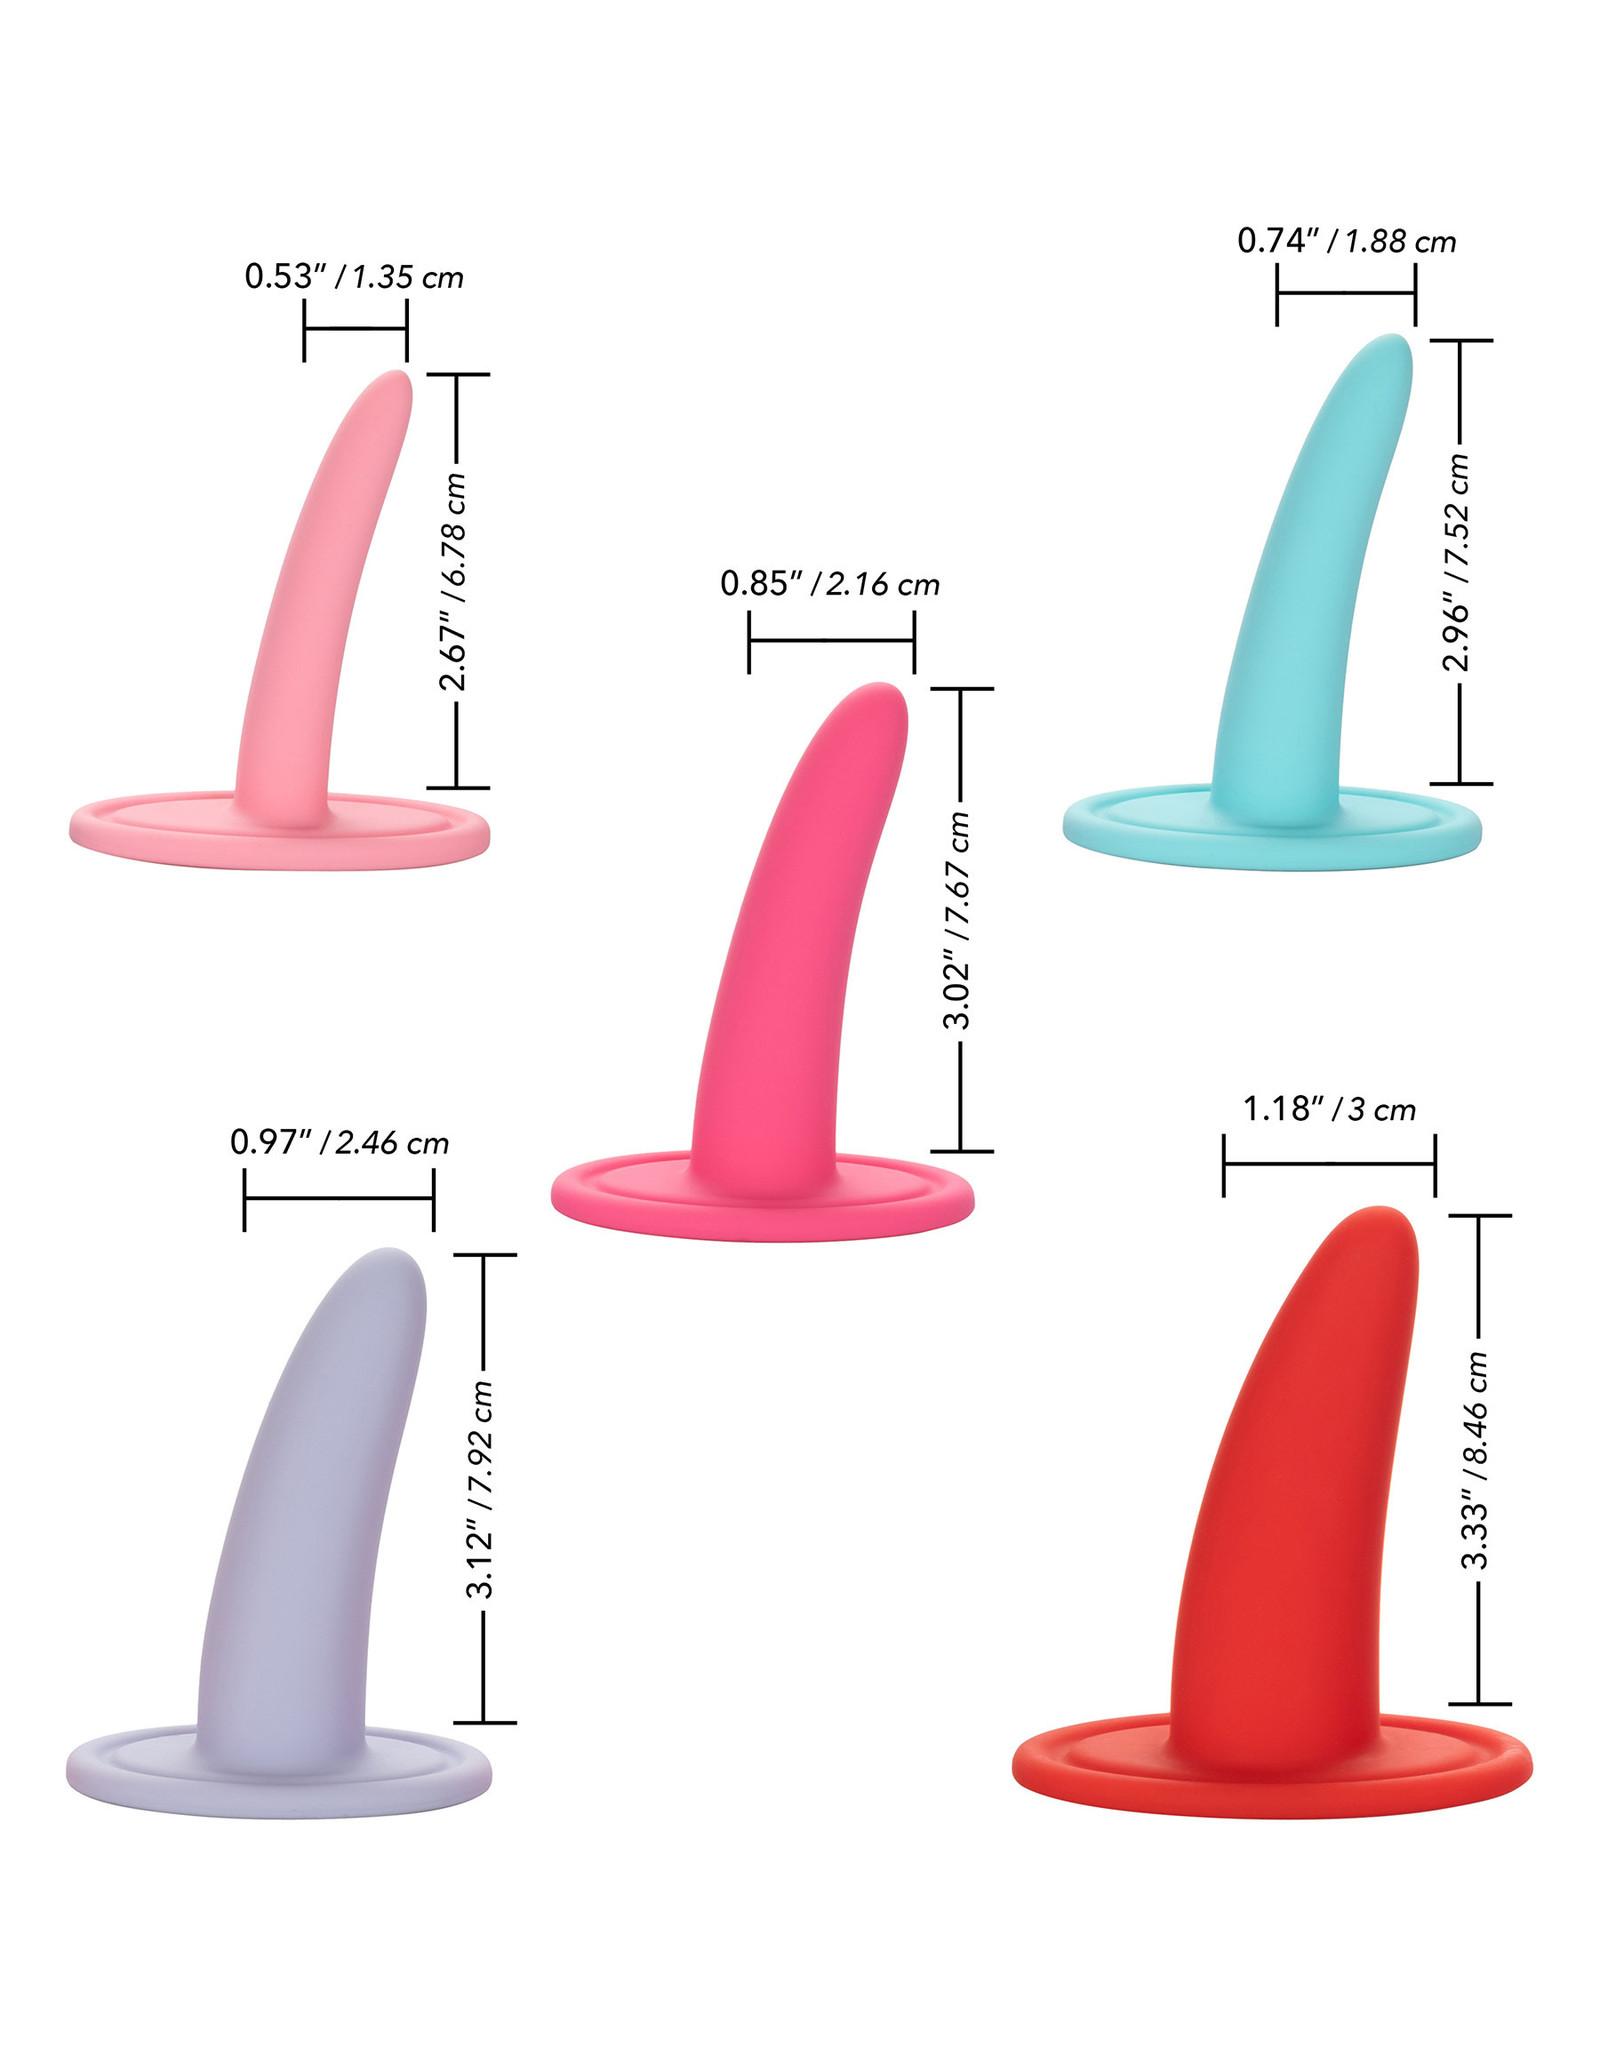 California Exotics She-ology 5 Piece Wearable Vaginal Dilator Set